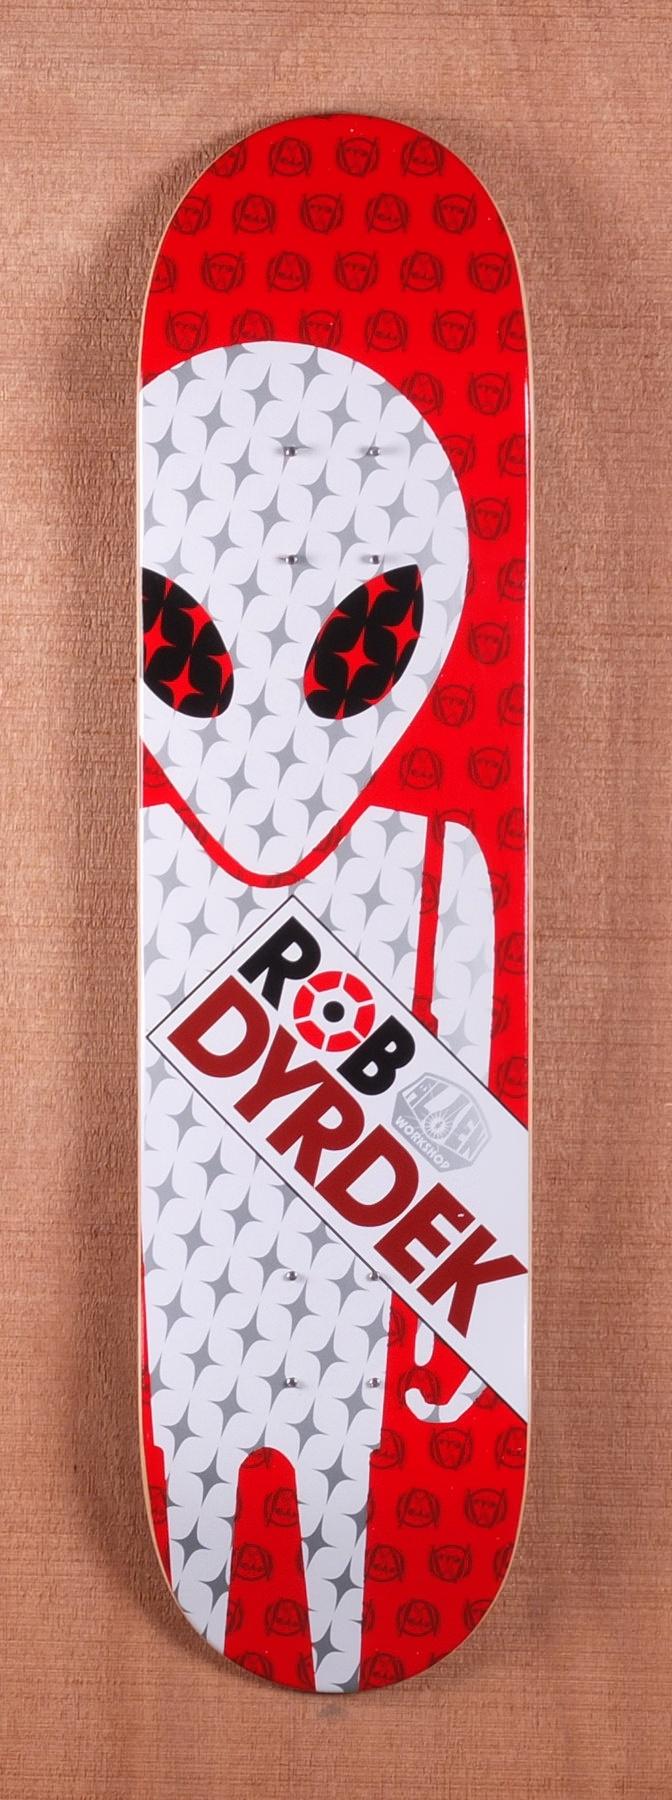 "Alien Workshop Dyrdek Soldier 7.75"" Skateboard Deck"